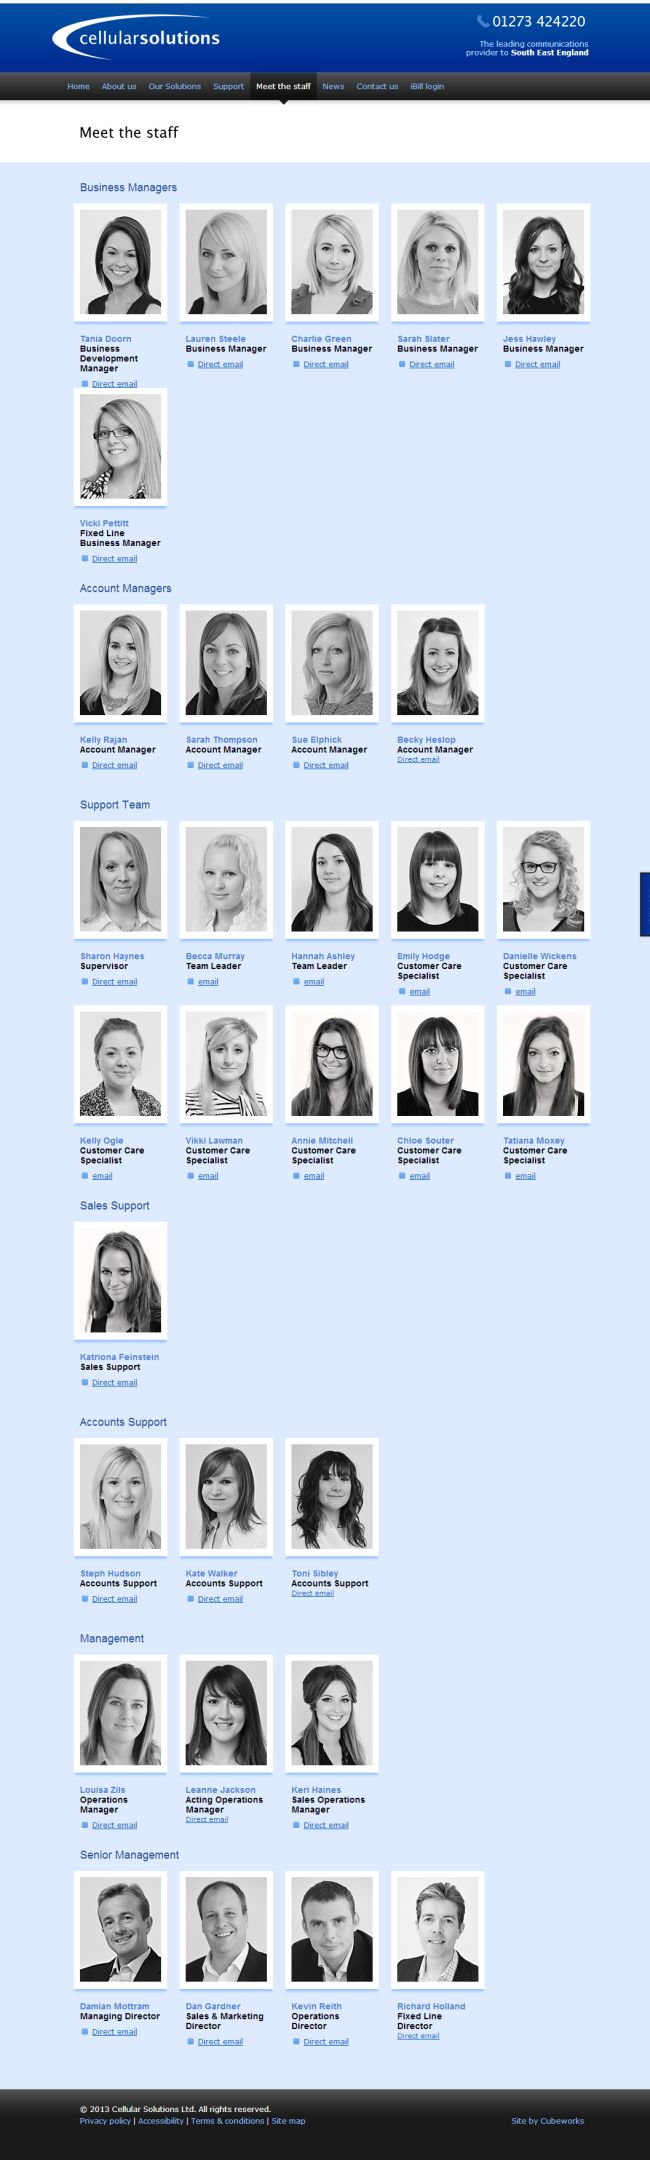 Meet the staff - Bell'ufficio!